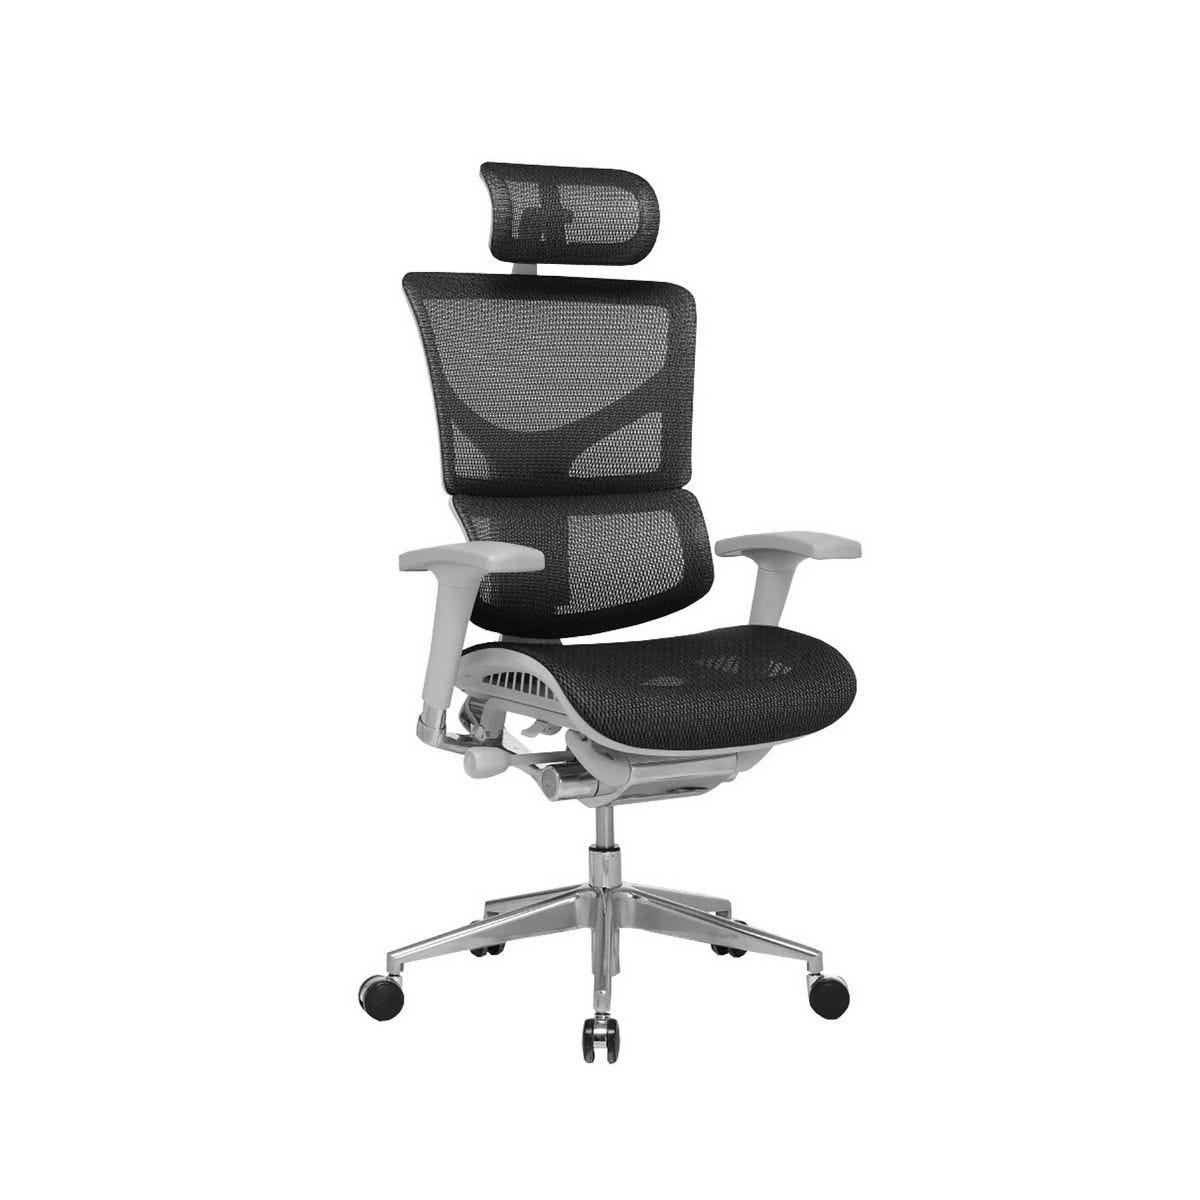 Ergonomic Mesh Office Chair With Headrest, Black